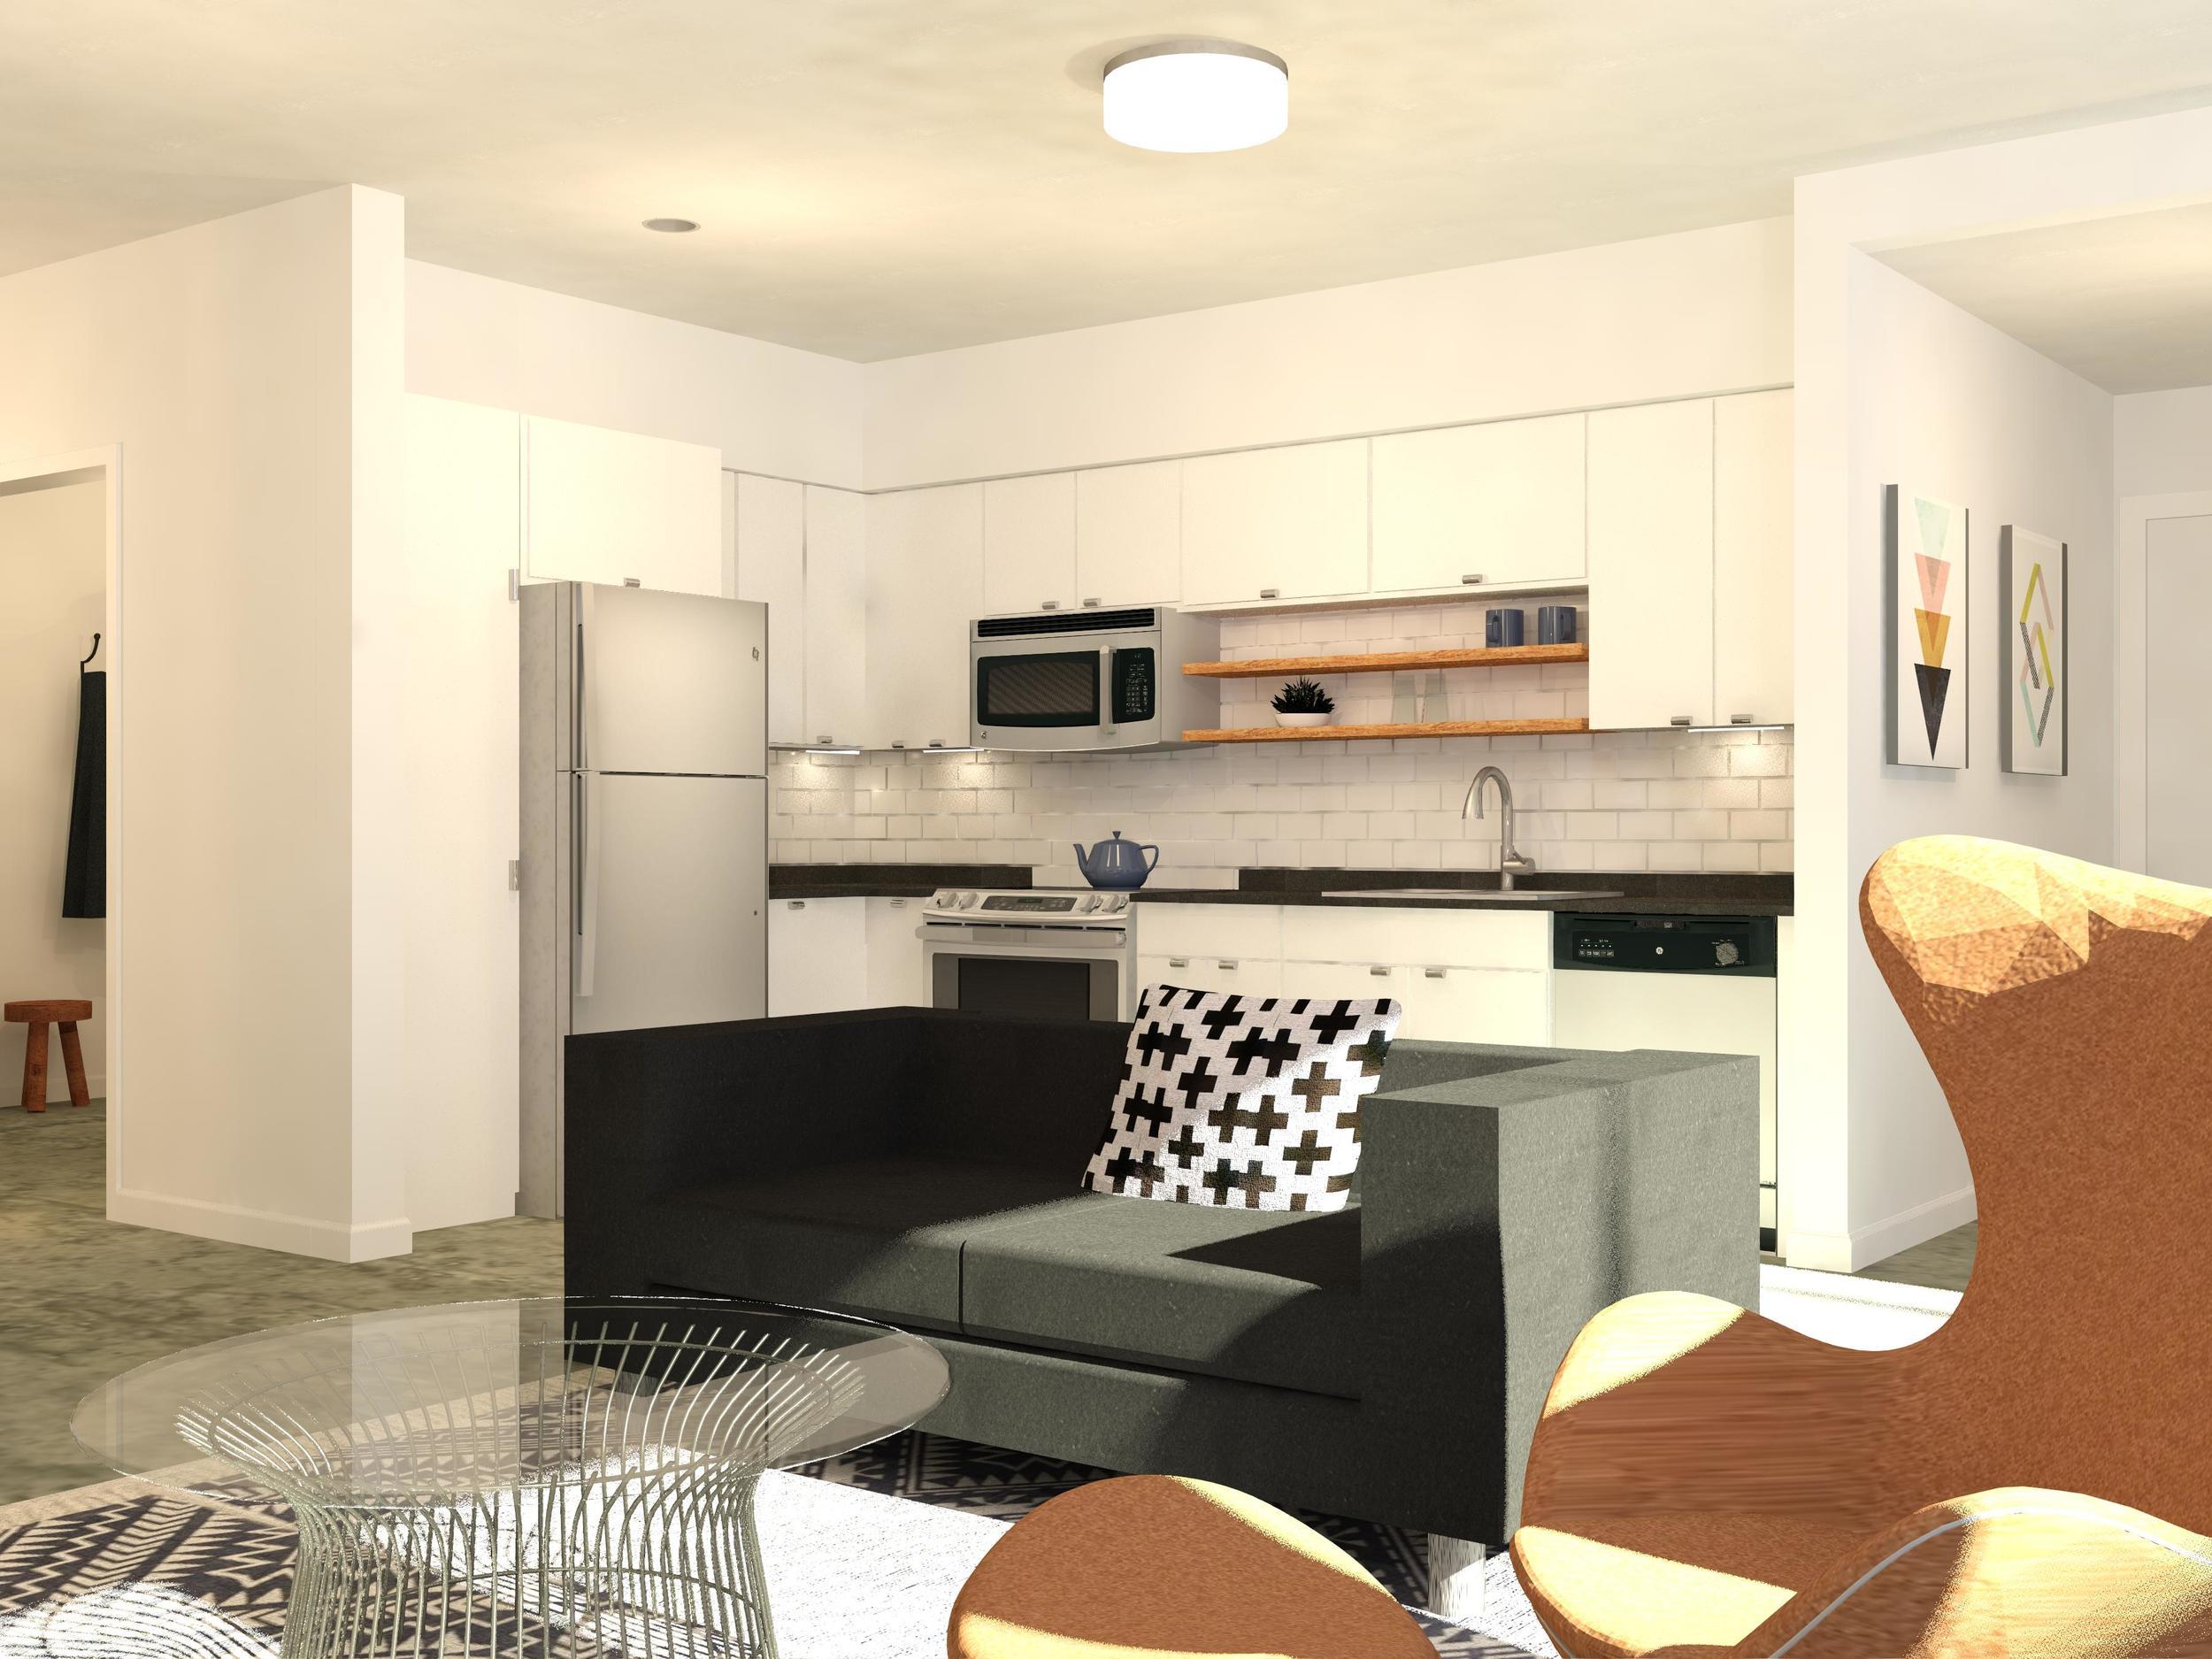 Perspective Living Room toward Kitchen - D 600dpi4.jpg